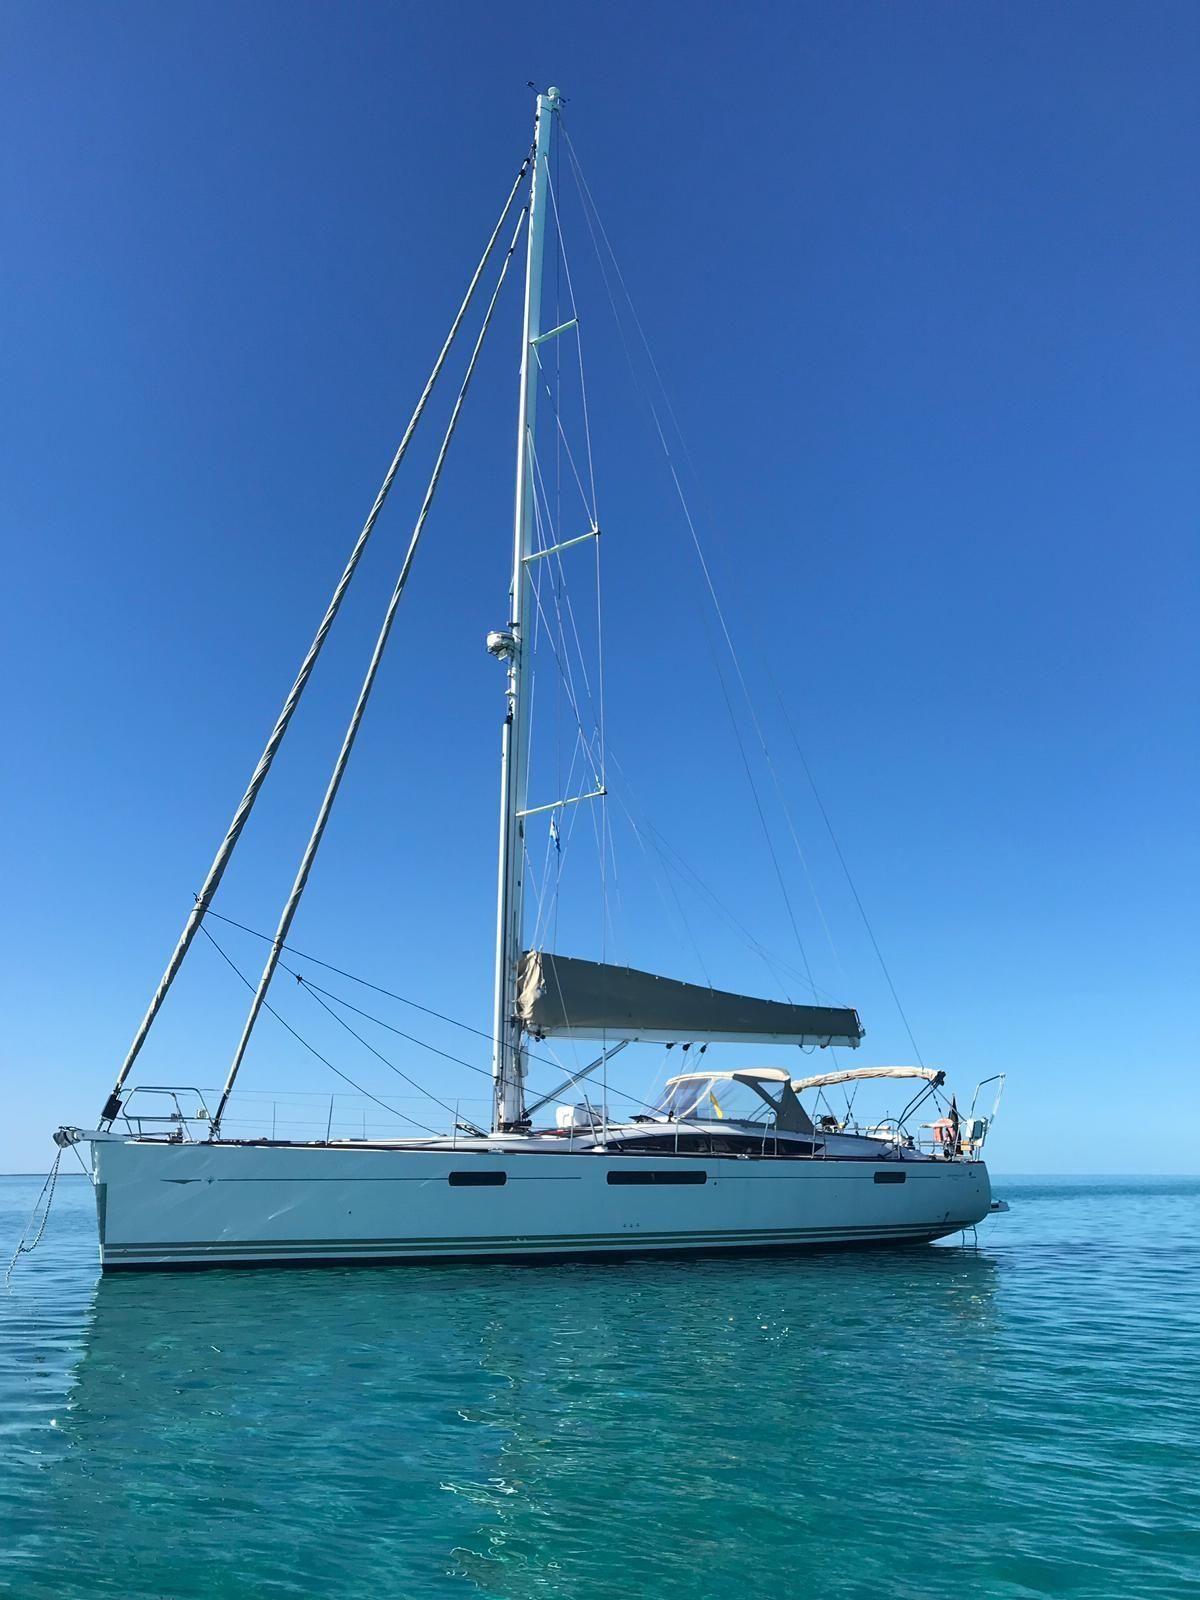 2015 Used Jeanneau 57 Cruiser Sailboat For Sale - $525,000